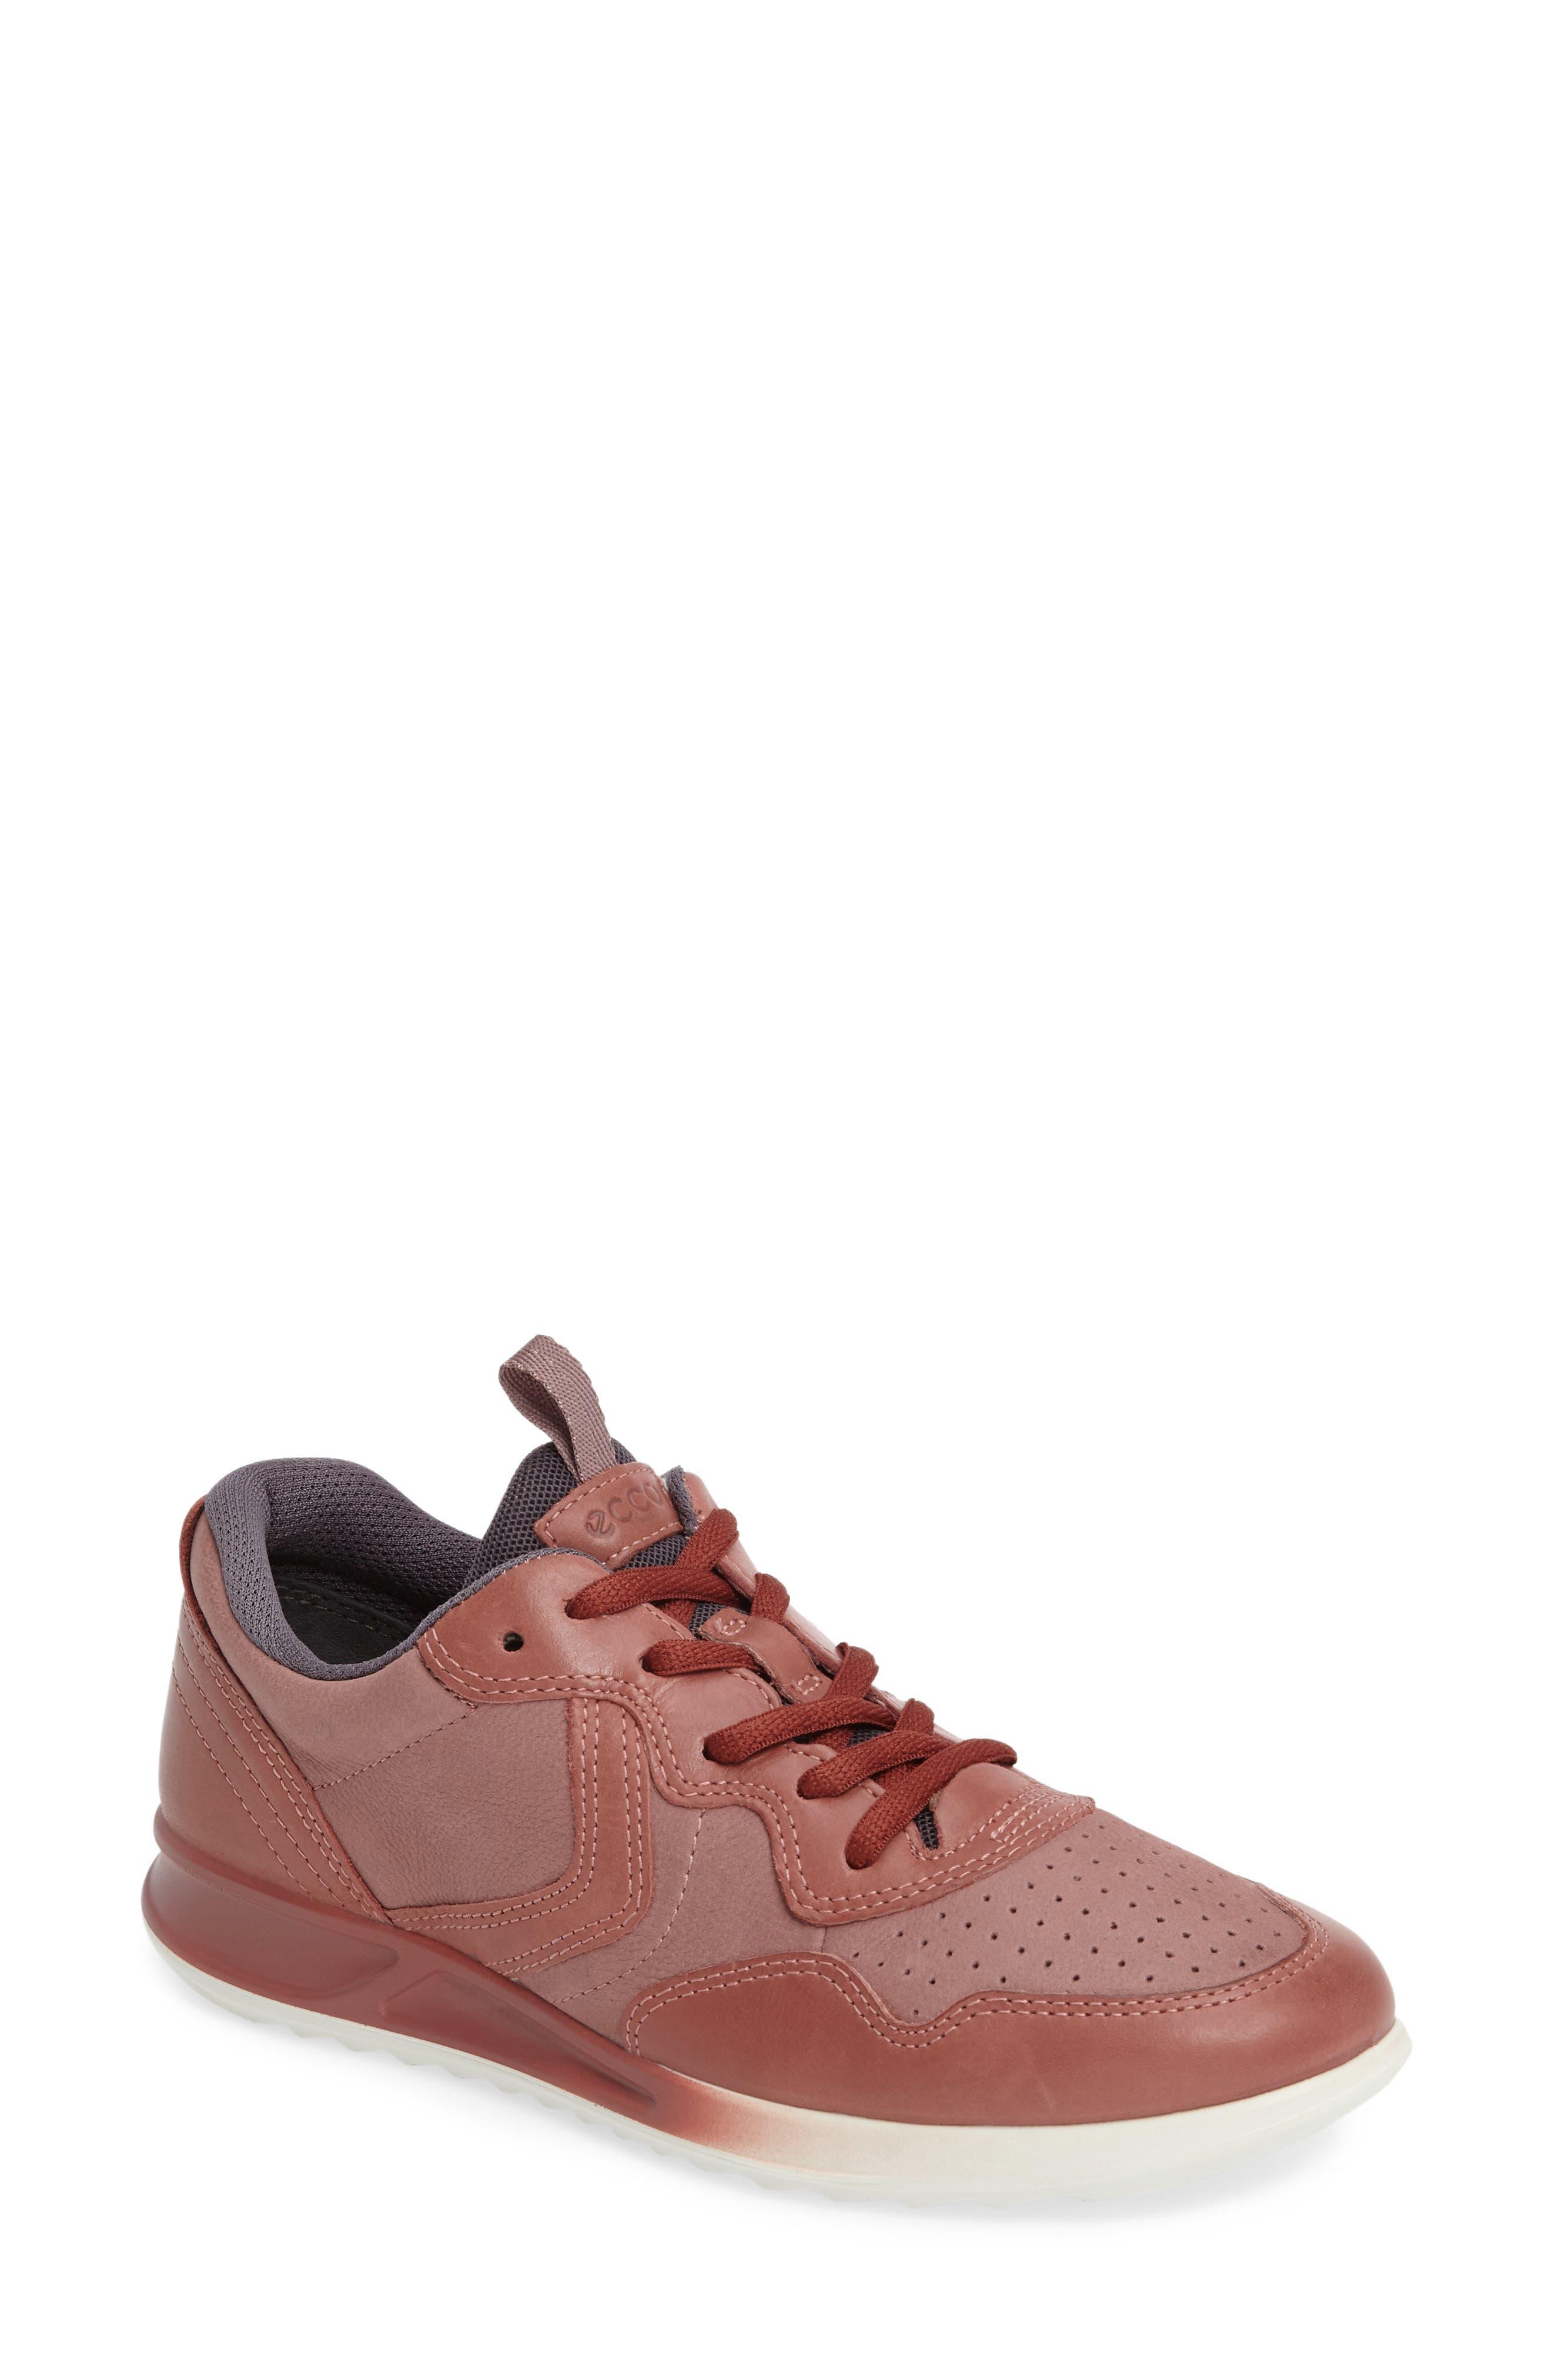 Genna Sneaker,                             Main thumbnail 1, color,                             Petal Leather